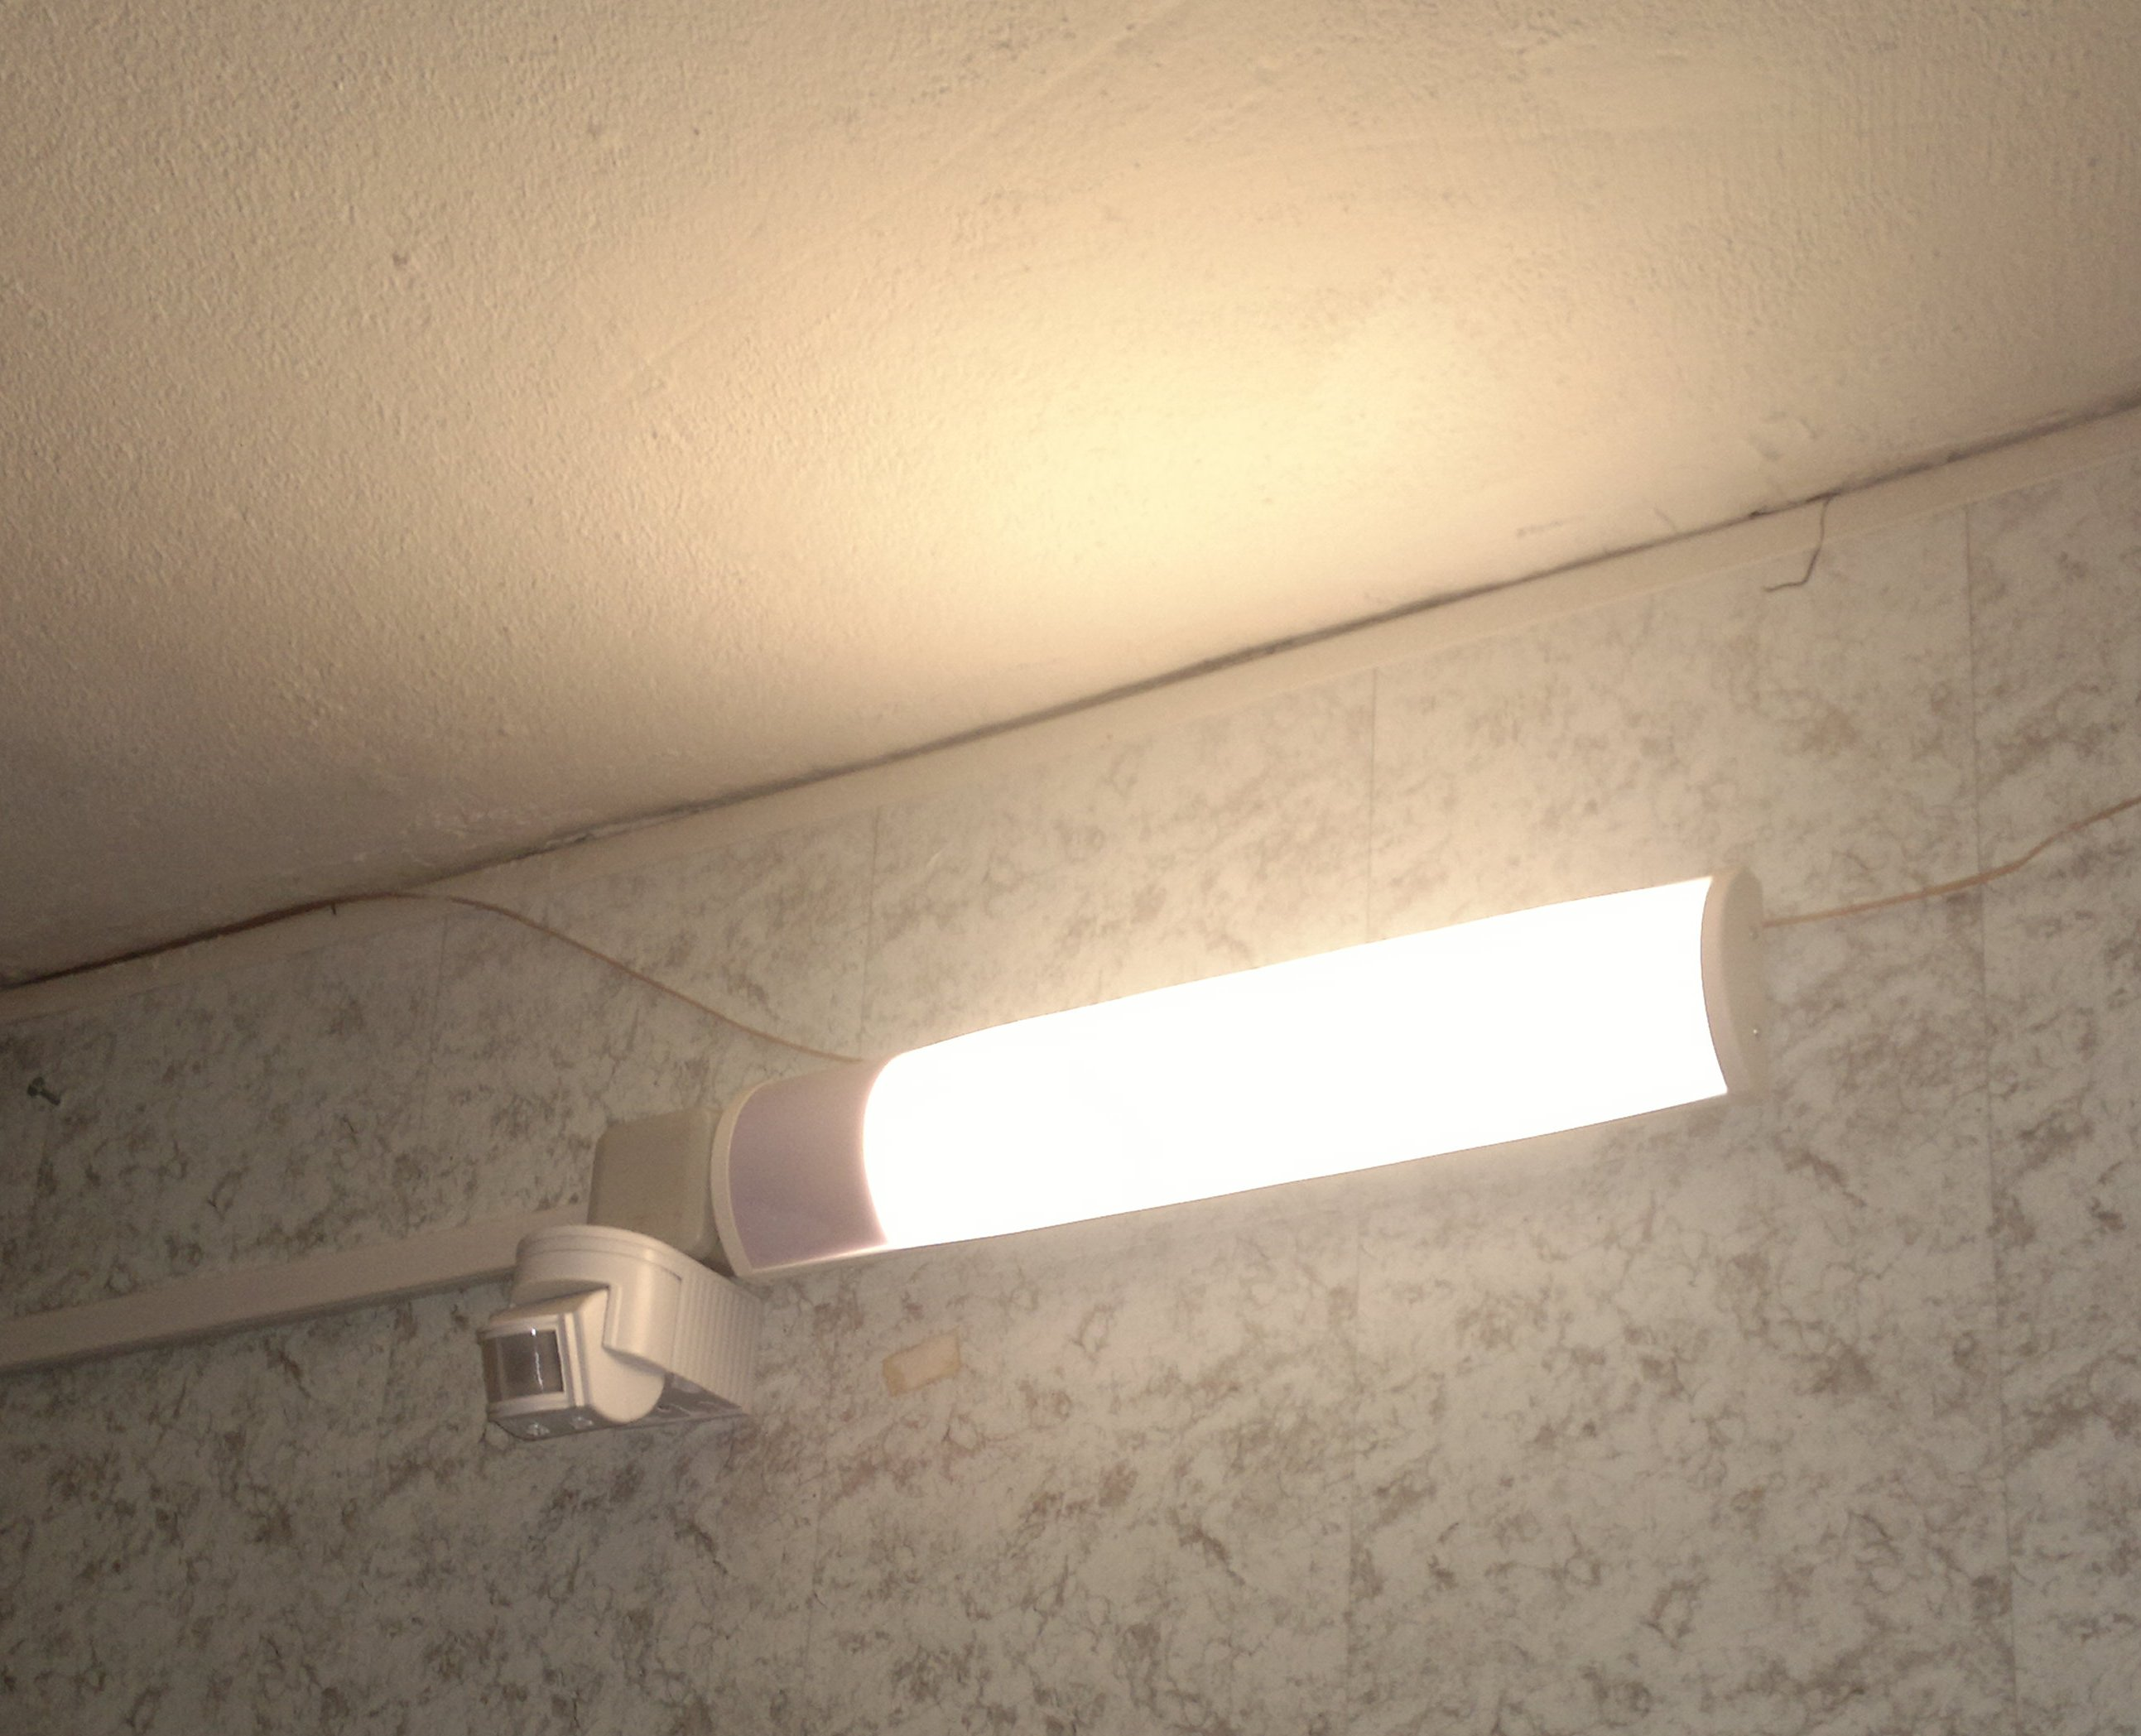 светильники для ЖКХ, светодиодные светильники